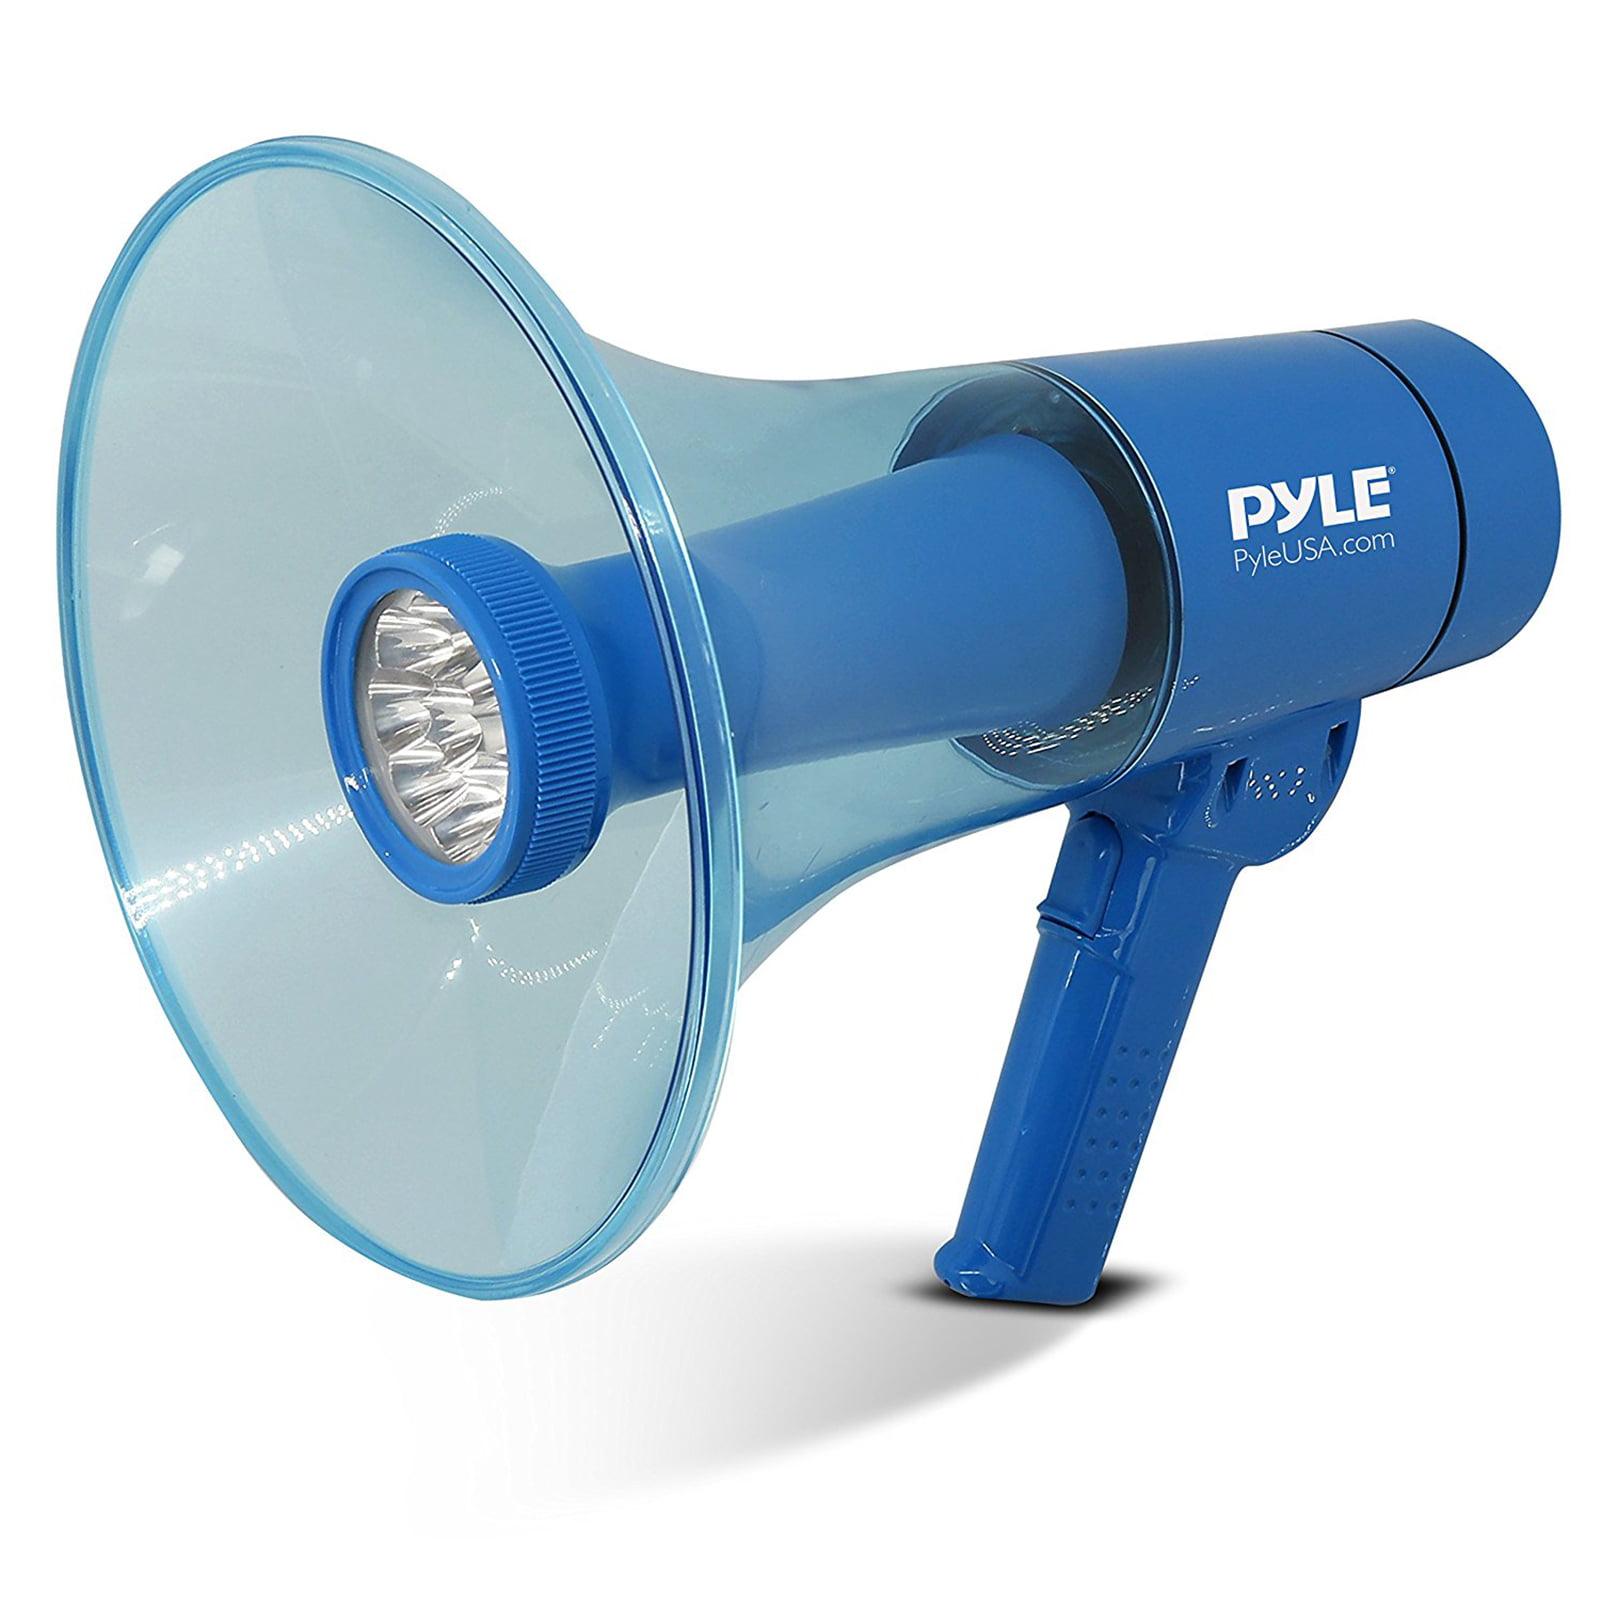 Pyle Portable Compact PA Megaphone Speaker w/ Alarm Siren, Adjustable Volume, 40 W Handheld Lightweight Marine Grade Waterproof Bullhorn, LED Flashlight, AA Battery Powered, Indoor Outdoor